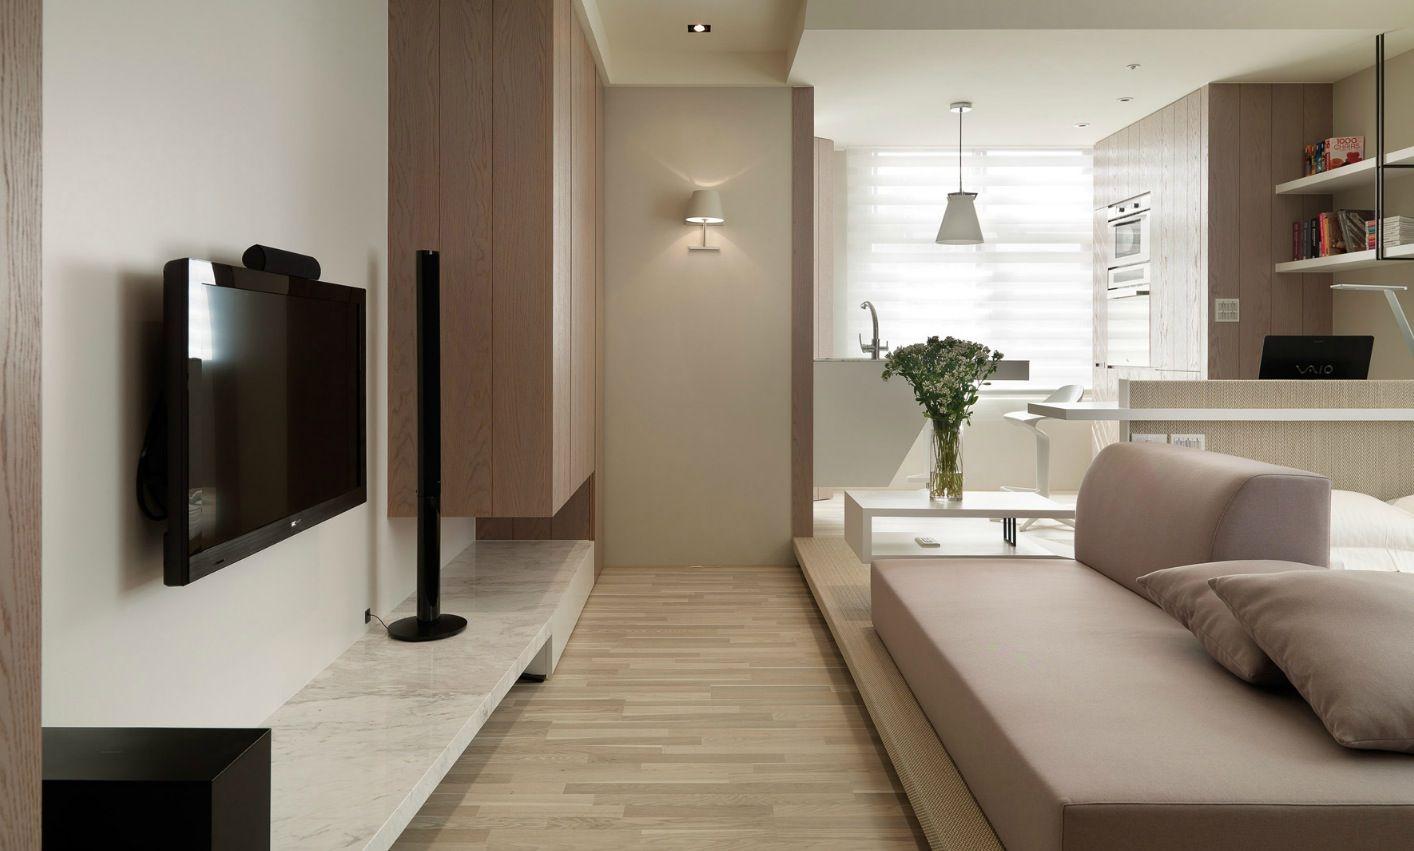 Studio Flat Designs studio flat design layout. best ideas about apartment layout on